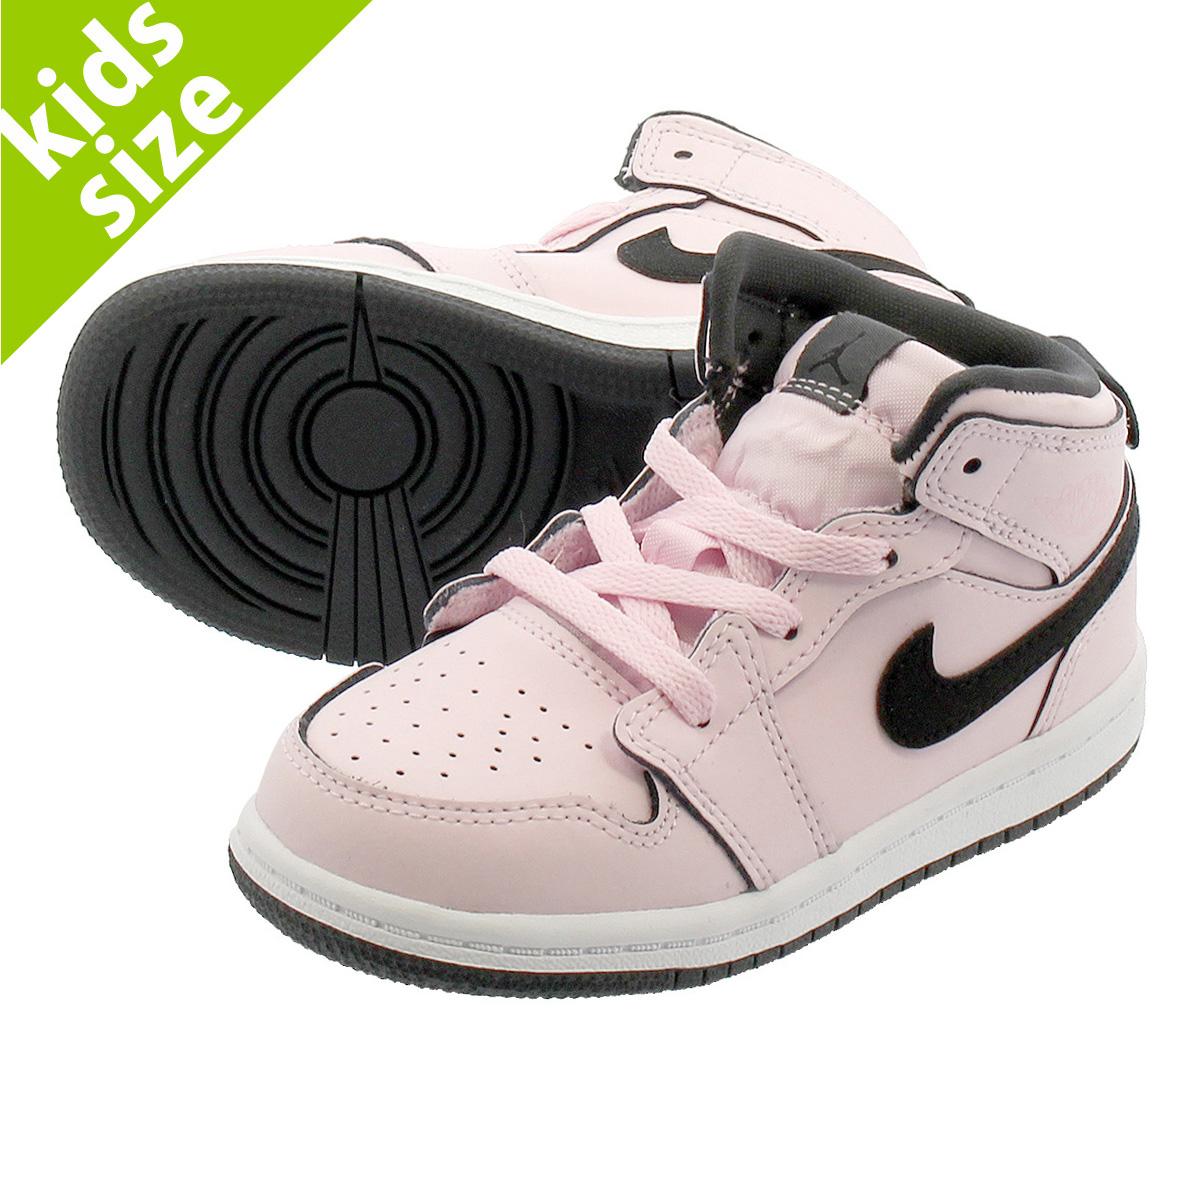 buy popular df82e 9a874 NIKE AIR JORDAN 1 MID GT Nike Air Jordan 1 mid GT PINK FOAM   BLACK WHITE ANTHRACITE 644,507-601